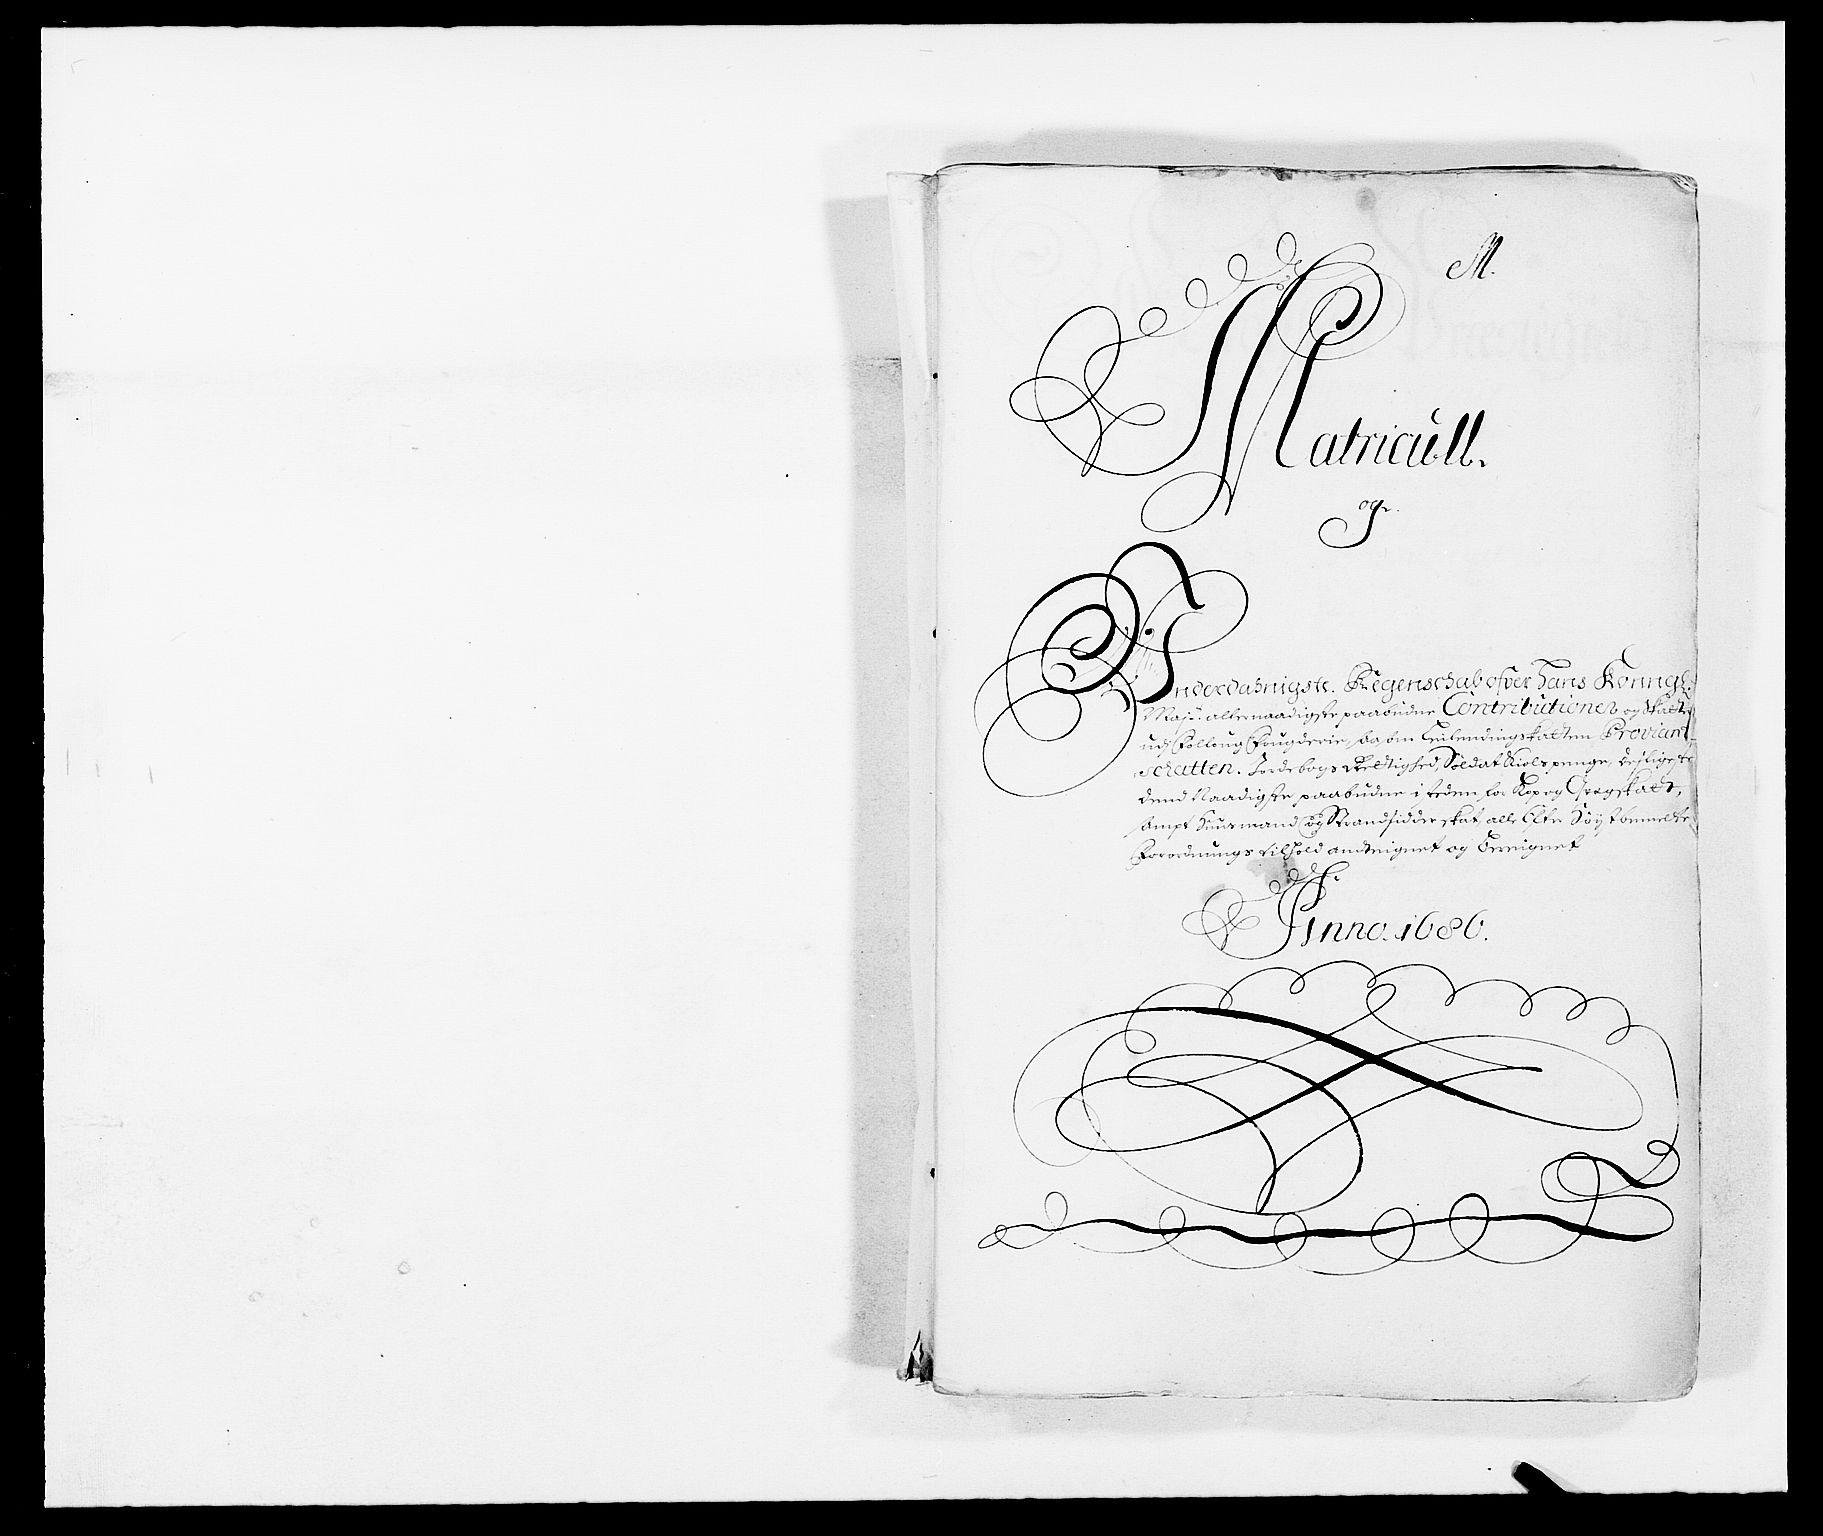 RA, Rentekammeret inntil 1814, Reviderte regnskaper, Fogderegnskap, R09/L0433: Fogderegnskap Follo, 1685-1686, s. 246